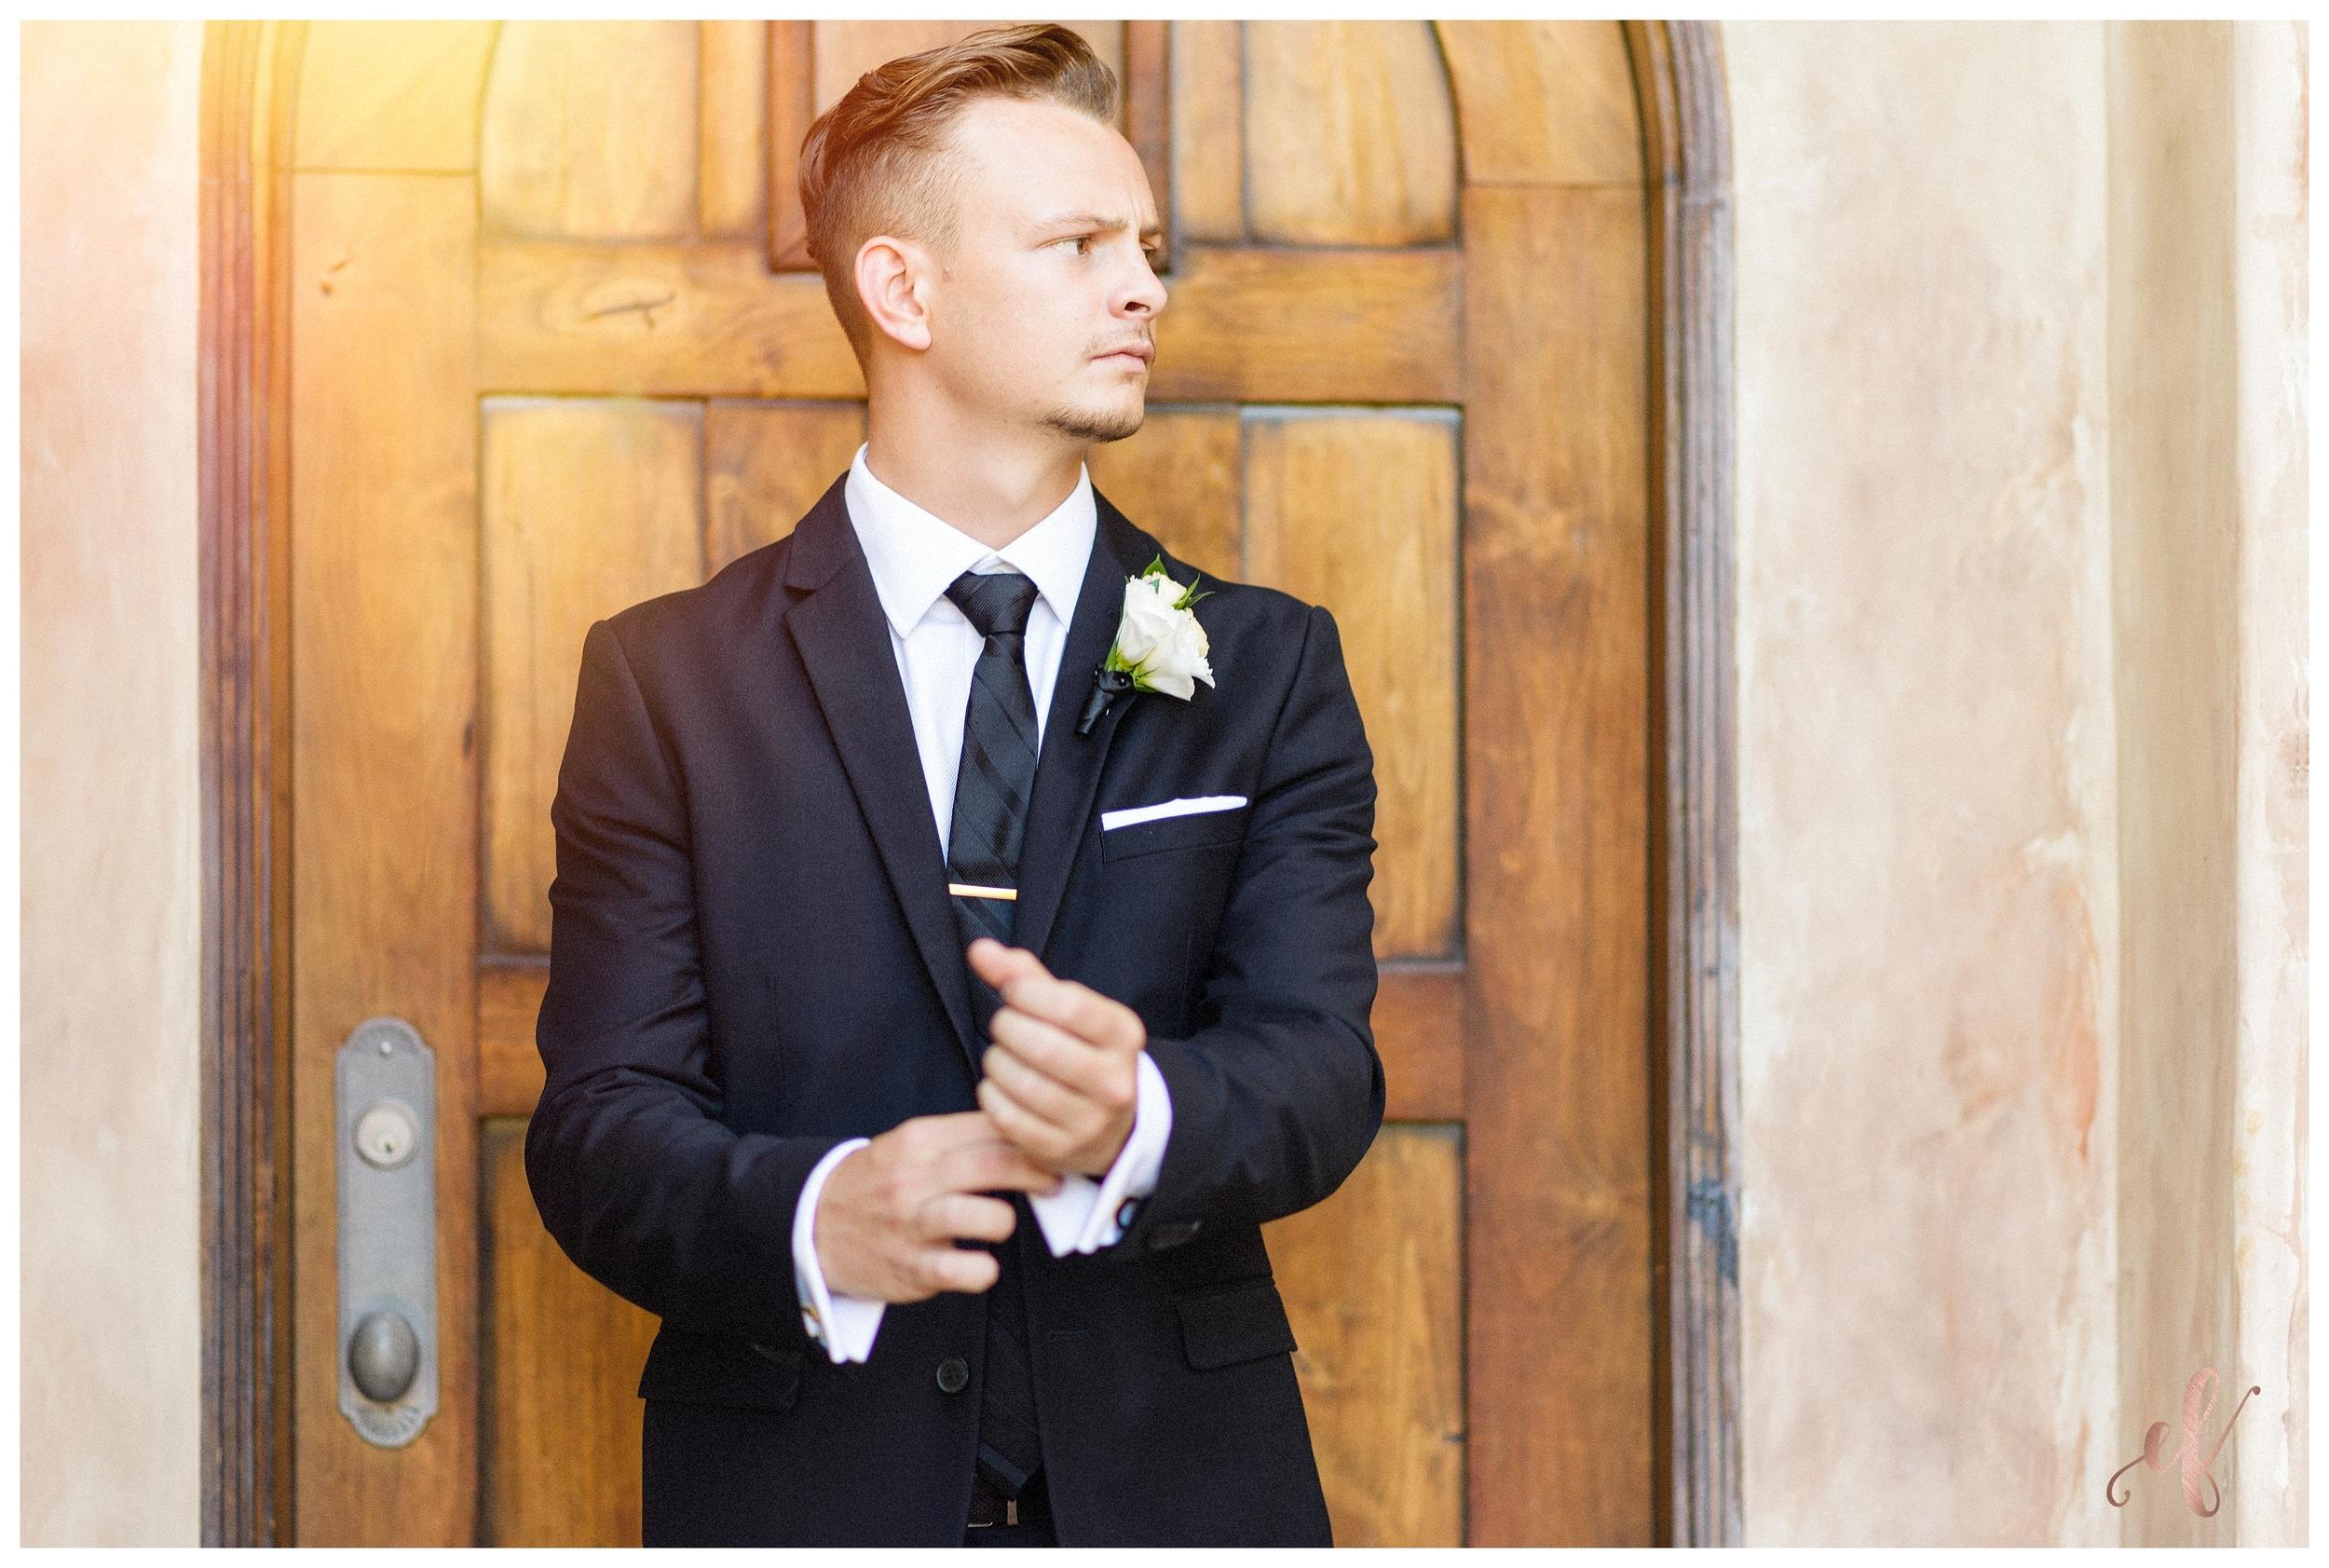 San Diego Wedding Photographer   Ernie & Fiona Photography   Groom   Pose   Rock   Cuff Links